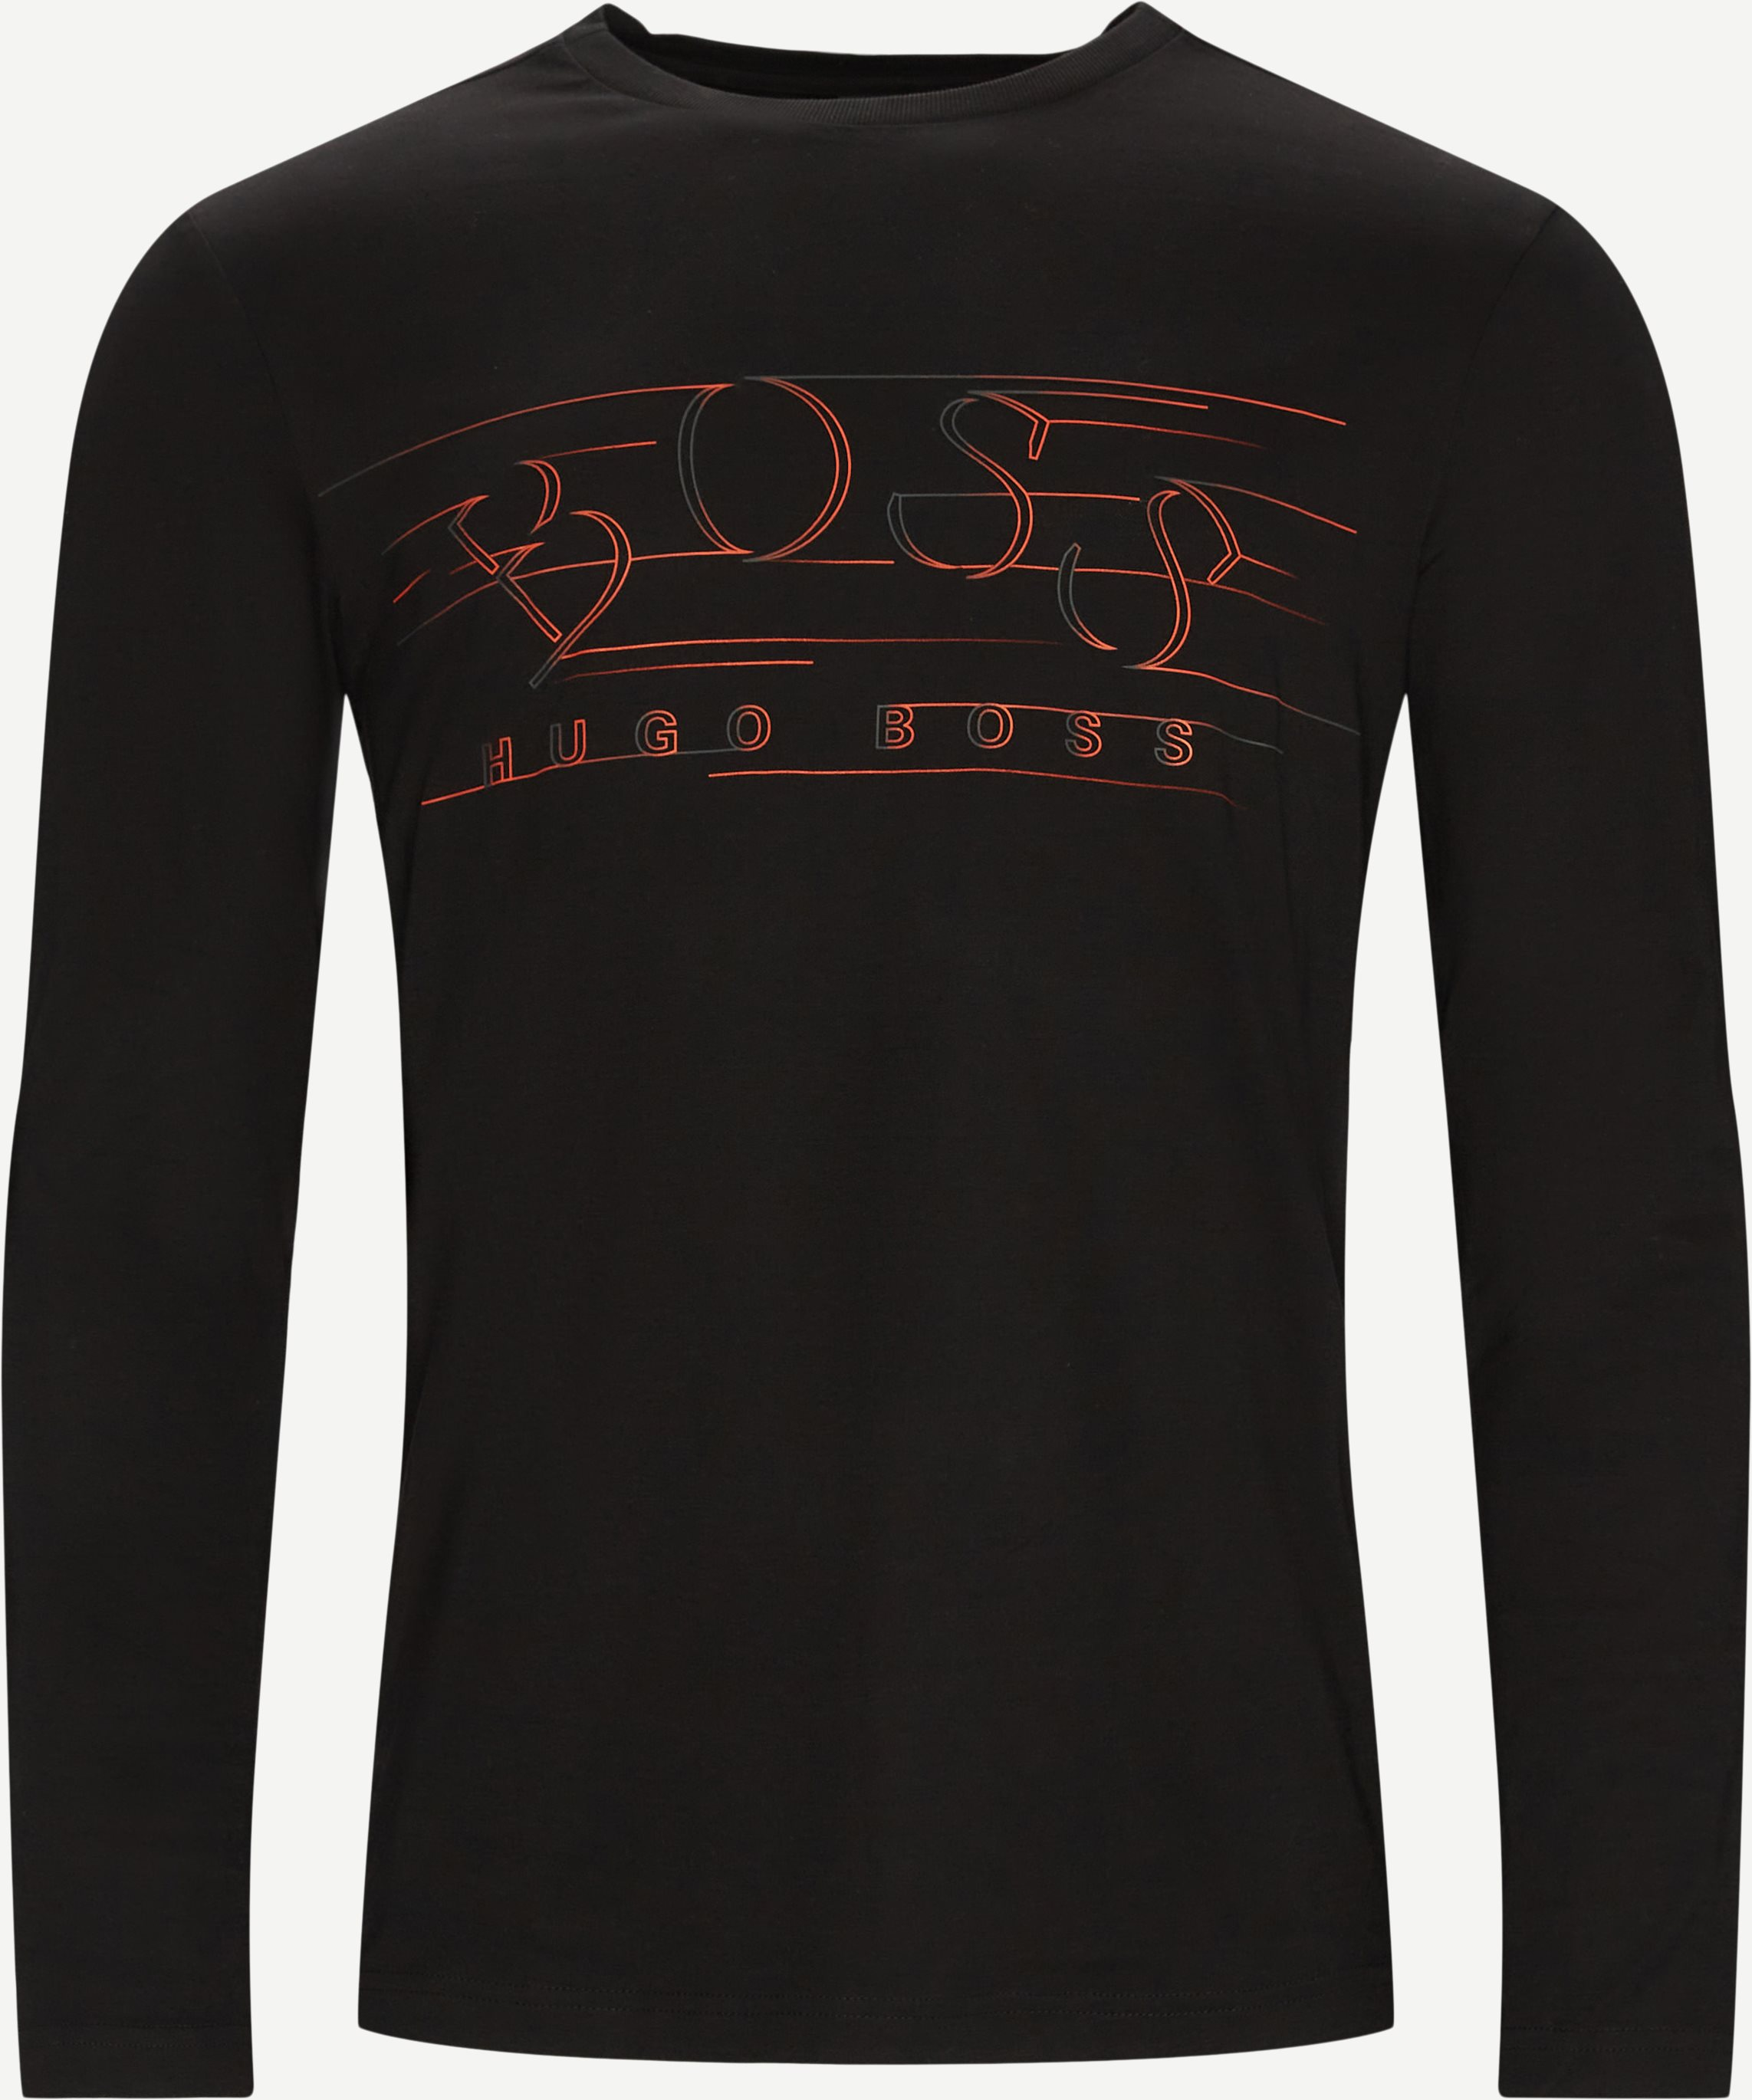 T-Shirts - Regular fit - Schwarz